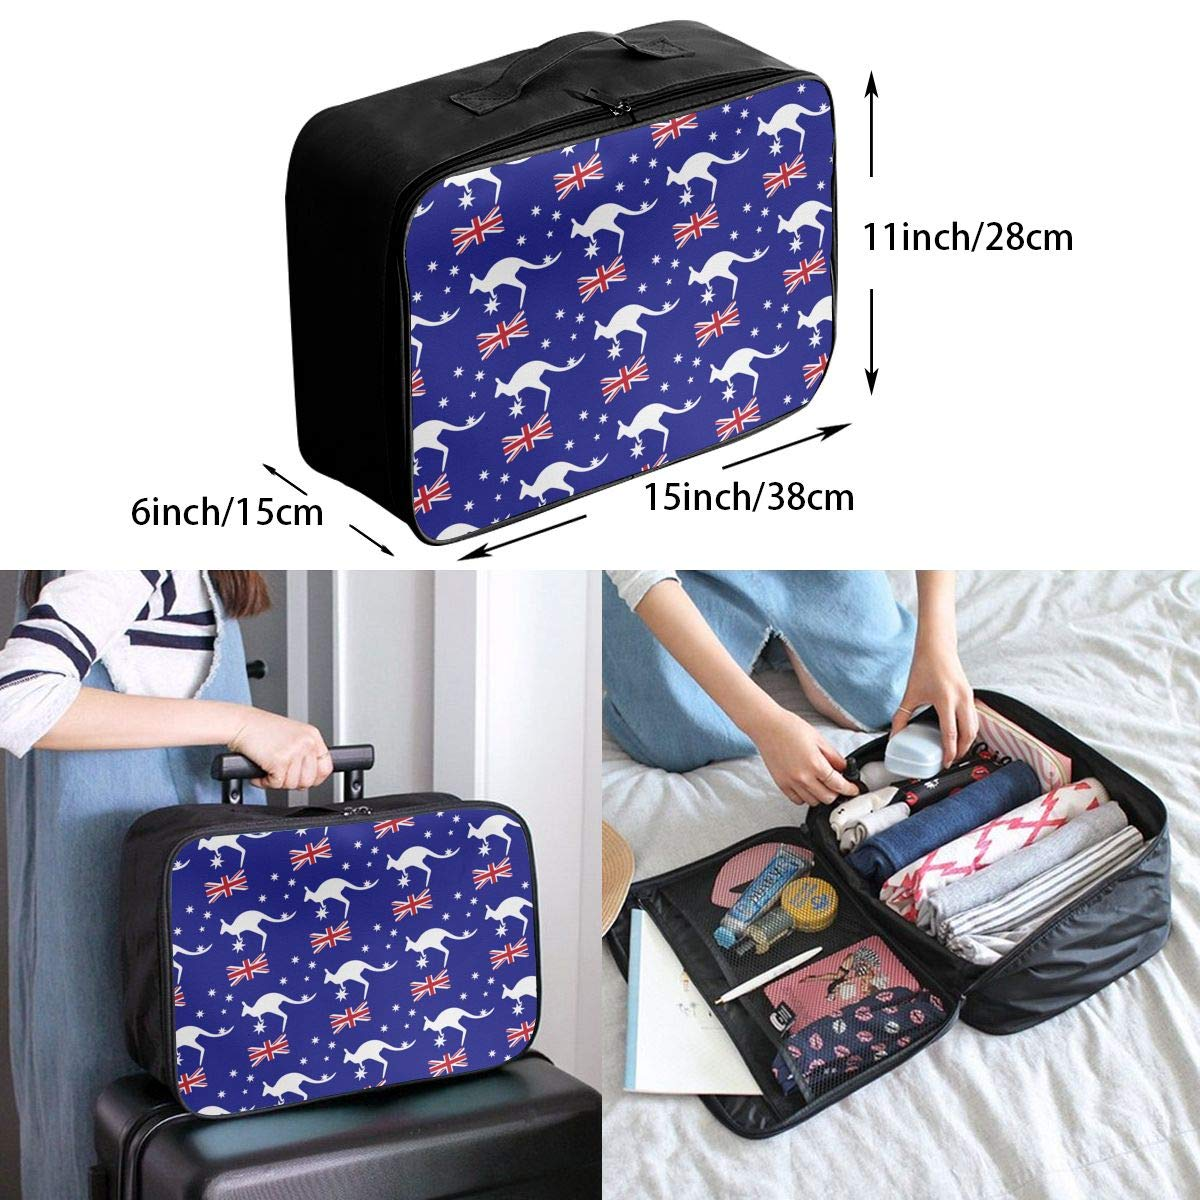 YueLJB Australia Flag Kagroo Lightweight Large Capacity Portable Luggage Bag Travel Duffel Bag Storage Carry Luggage Duffle Tote Bag